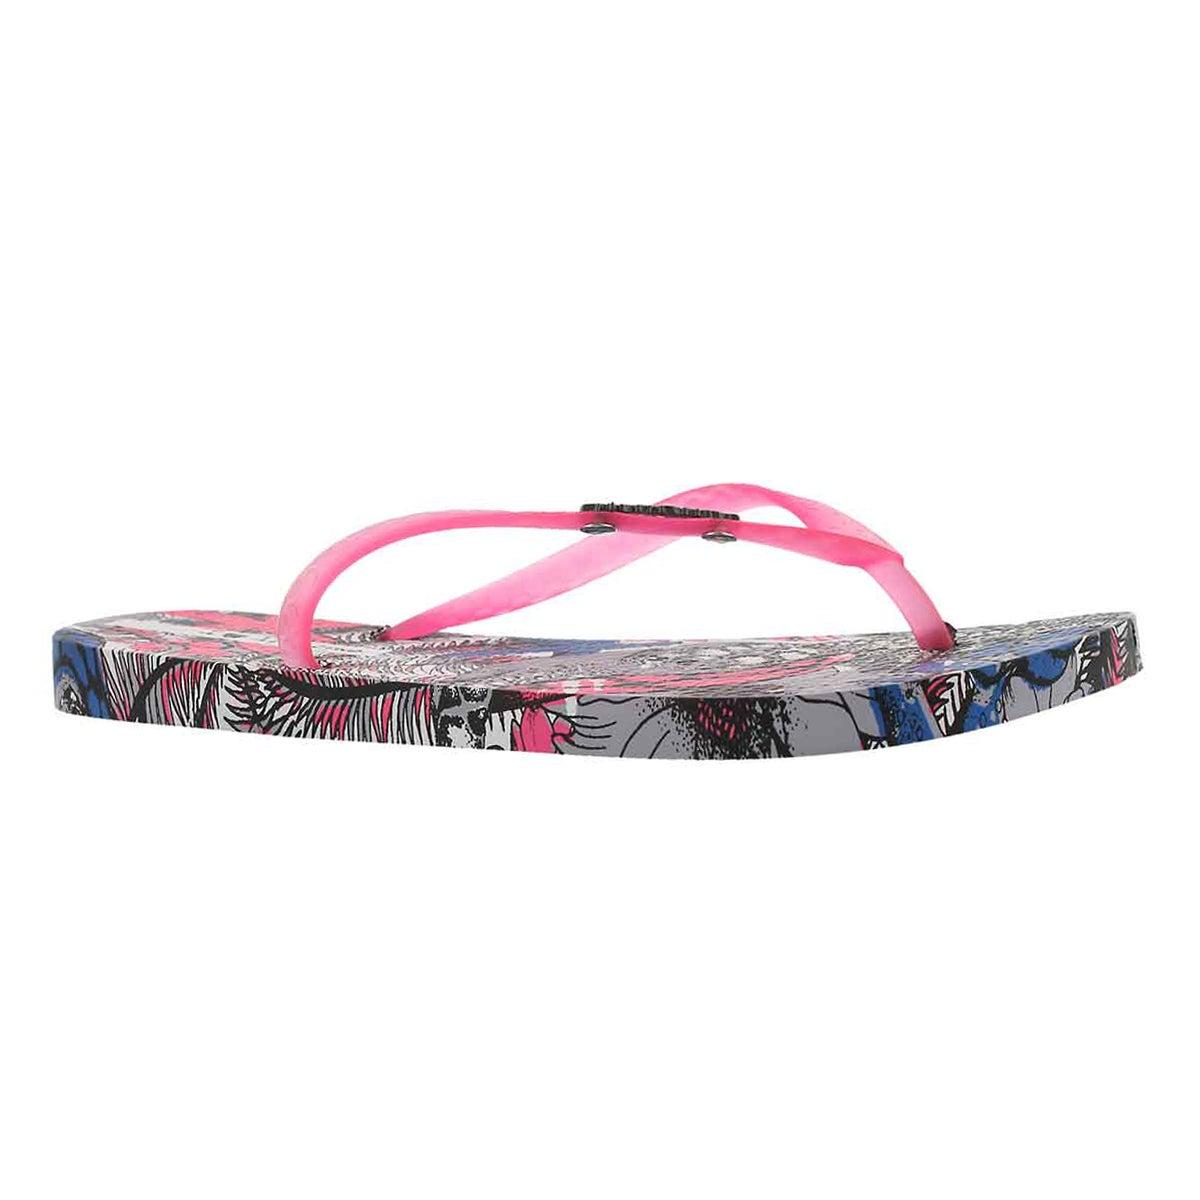 Women's TROPICAL BEAUTY grey/pink flip flops